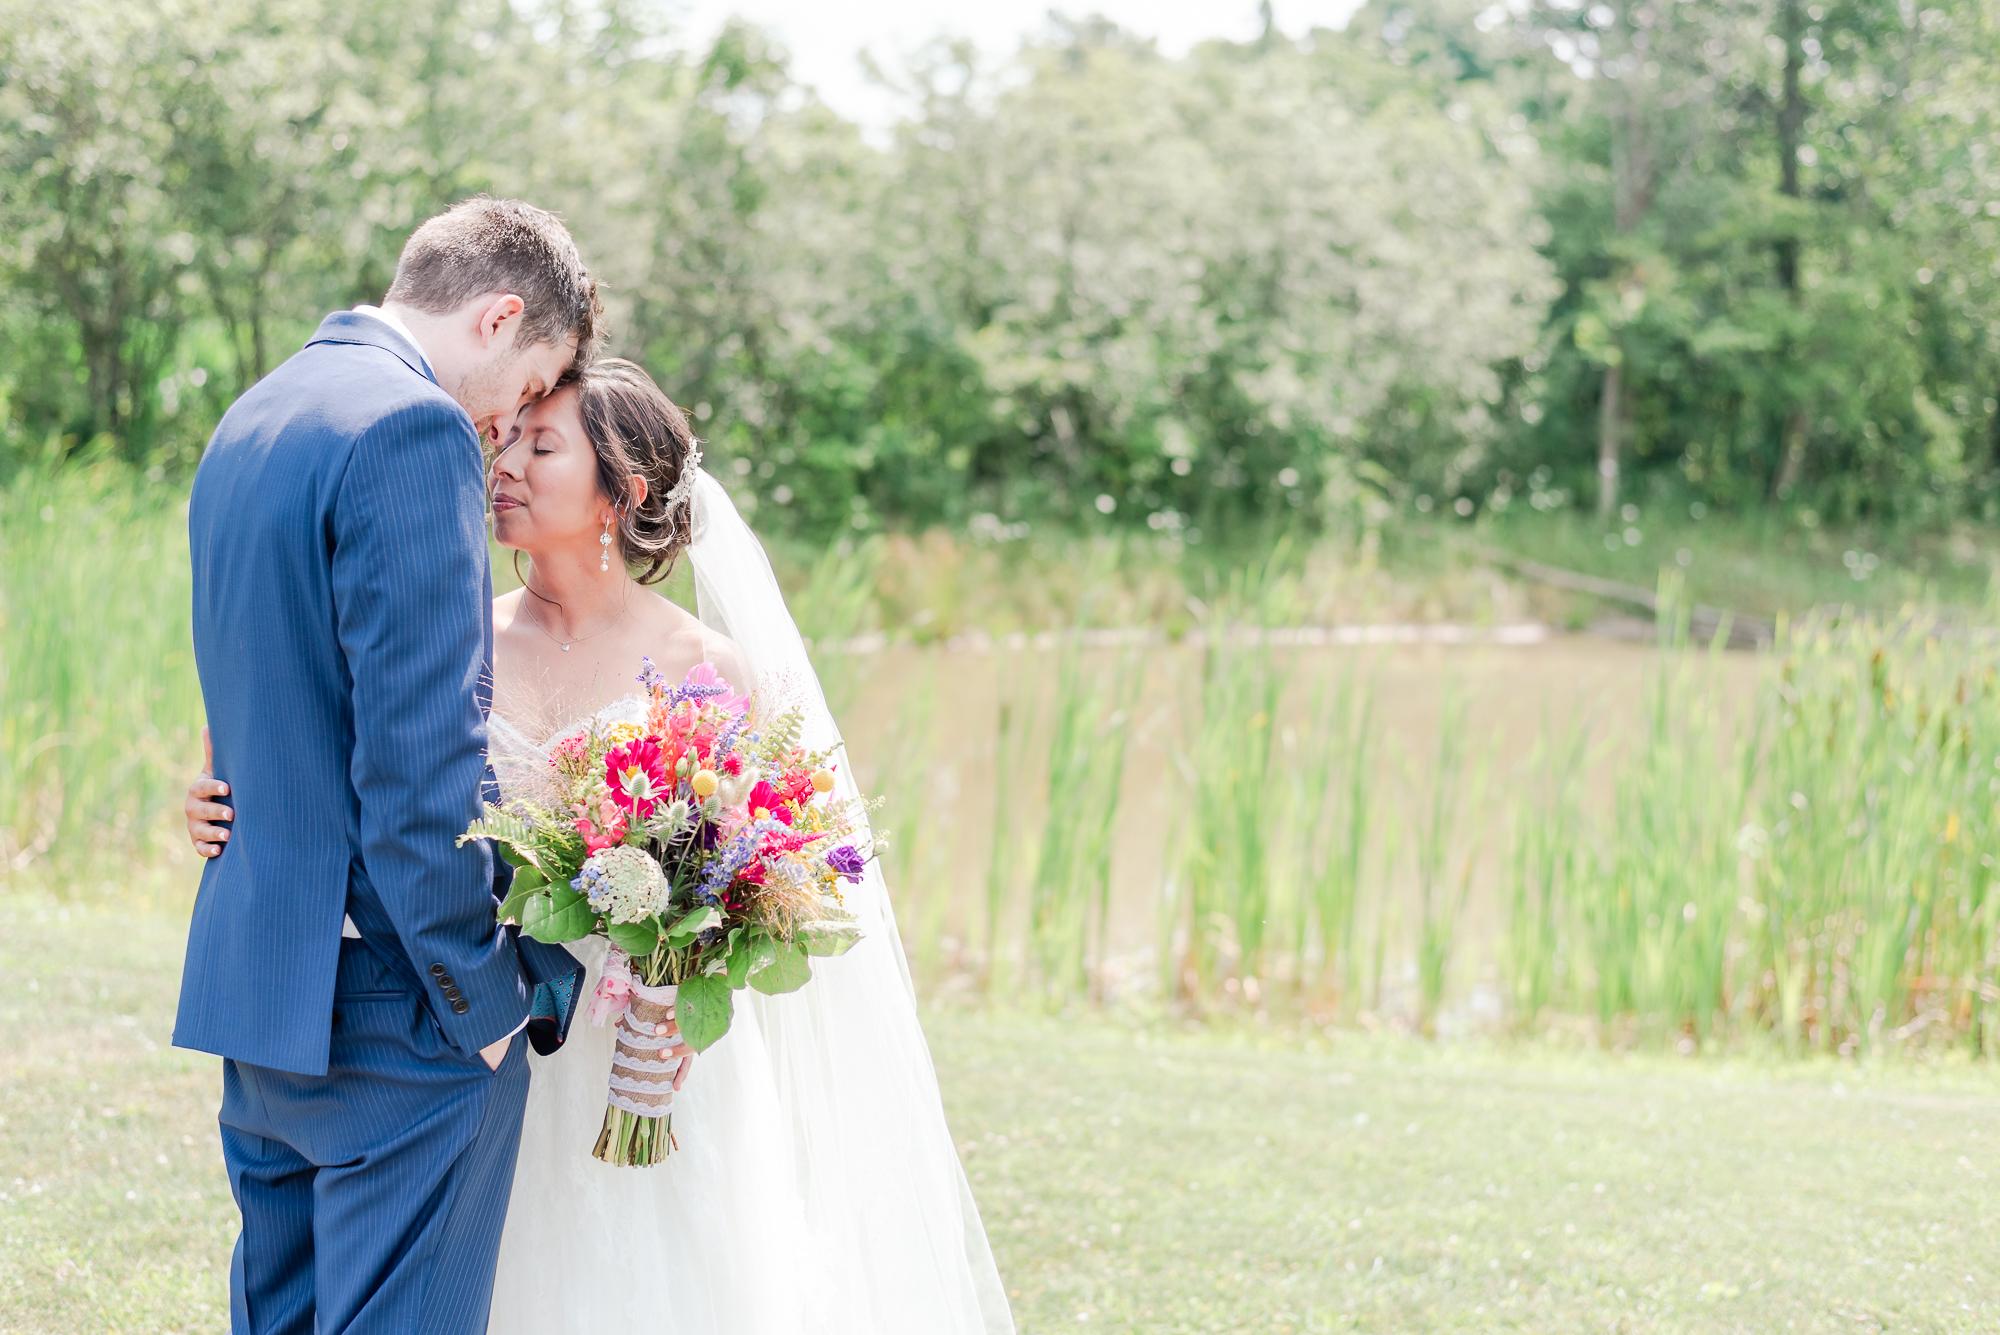 Maria+Adam_Summer Barn Wedding_The Barn and The North Star Preserve_Oberlin_Ohio-141.jpg